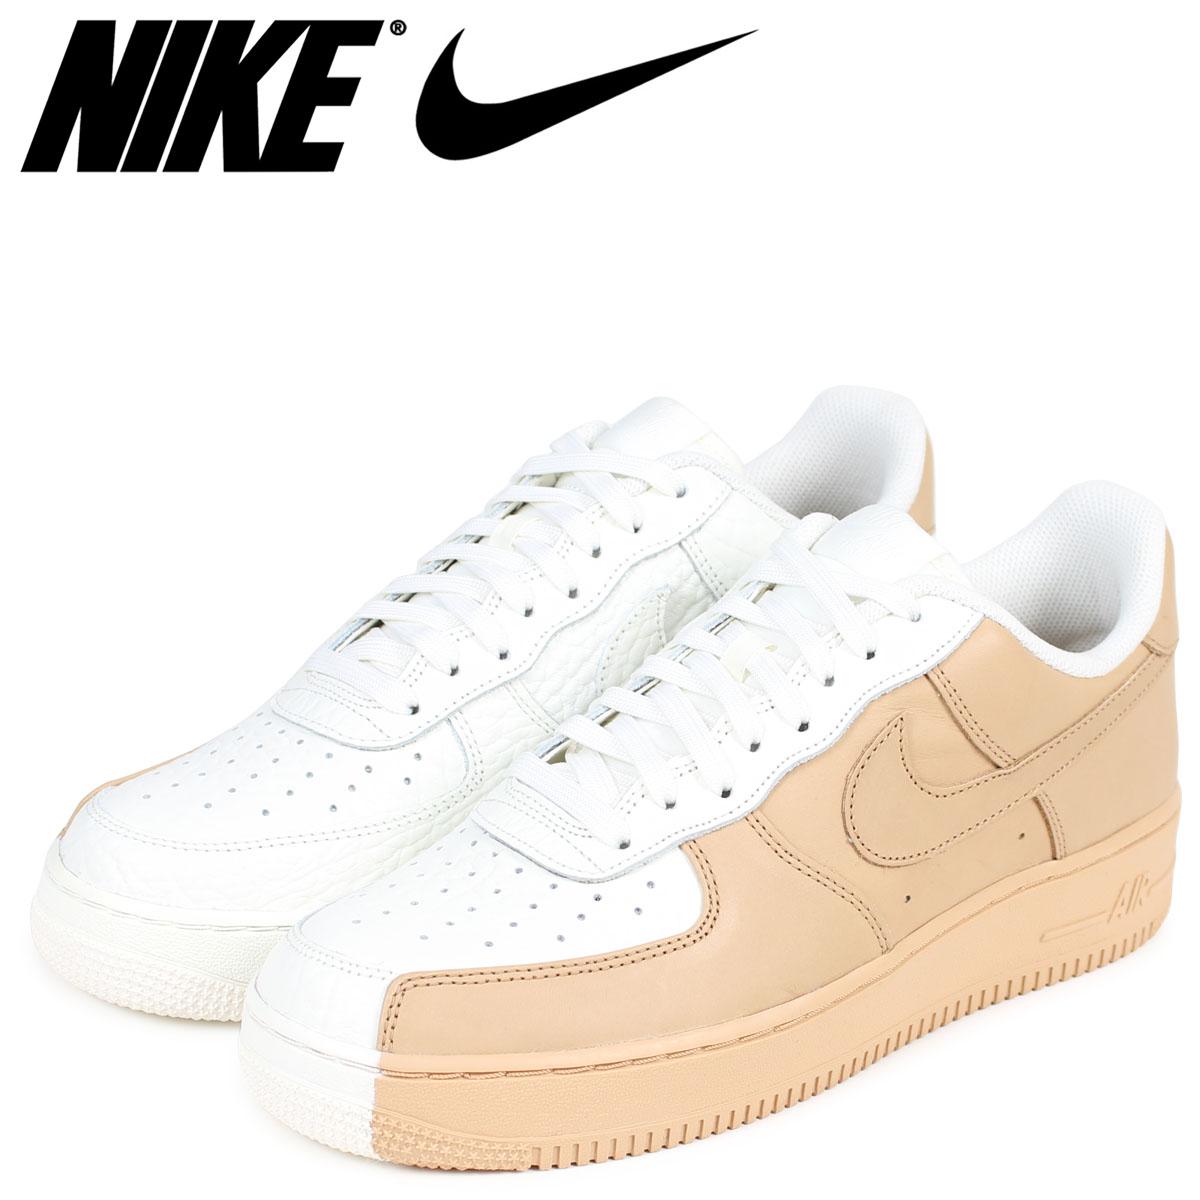 NIKE Nike air force 1 07 sneakers AIR FORCE 1 PREMIUM 905,345 105 men's white white